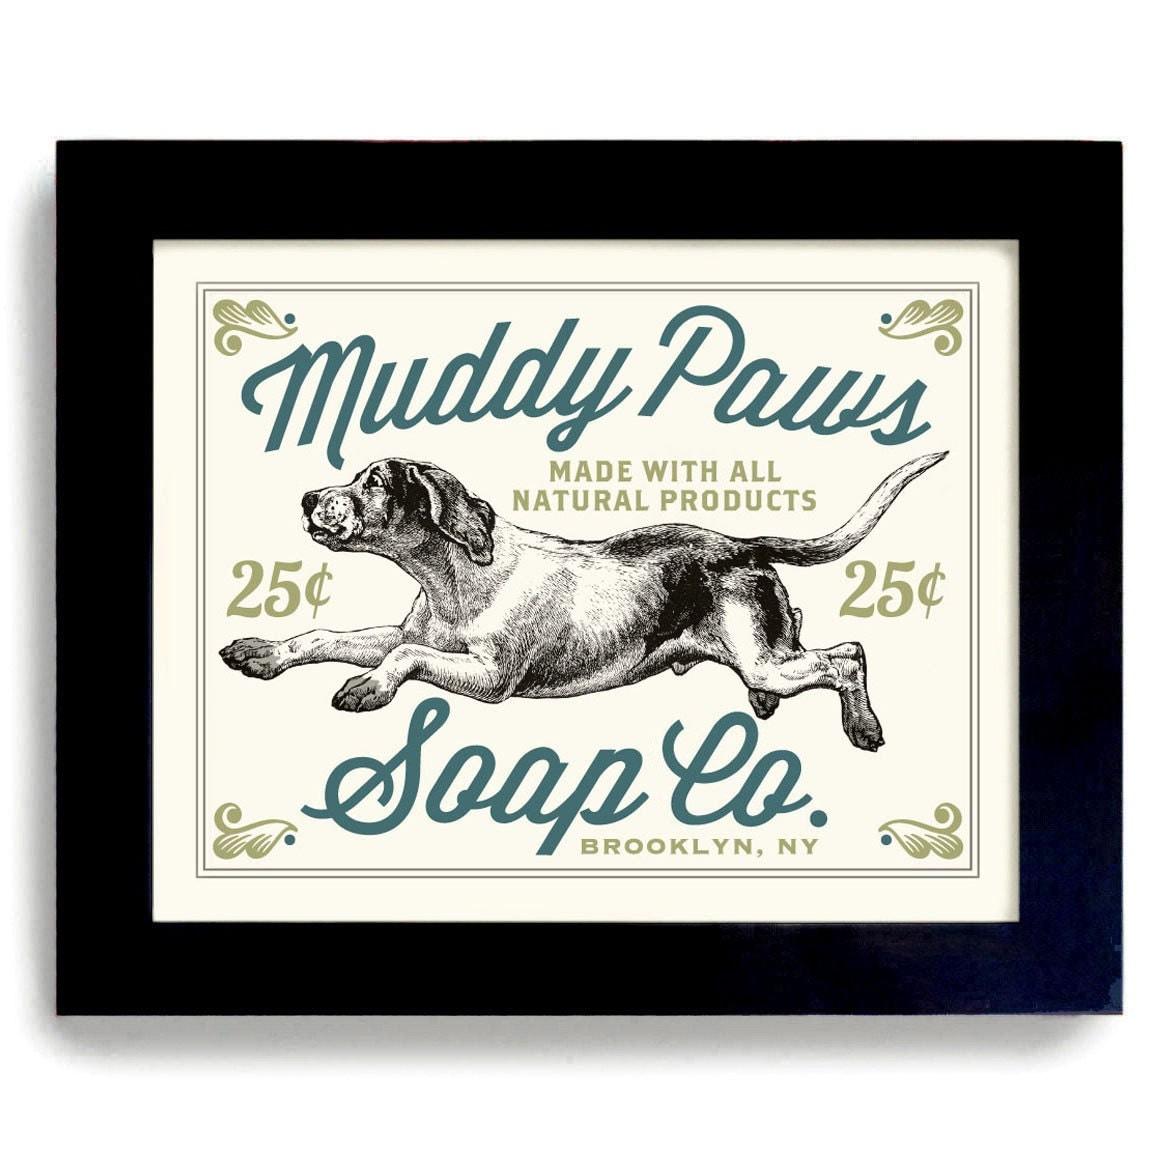 Laundry Room Signs Decor: Laundry Room Decor Dog Art Sign Bathroom Wall Art Mud By